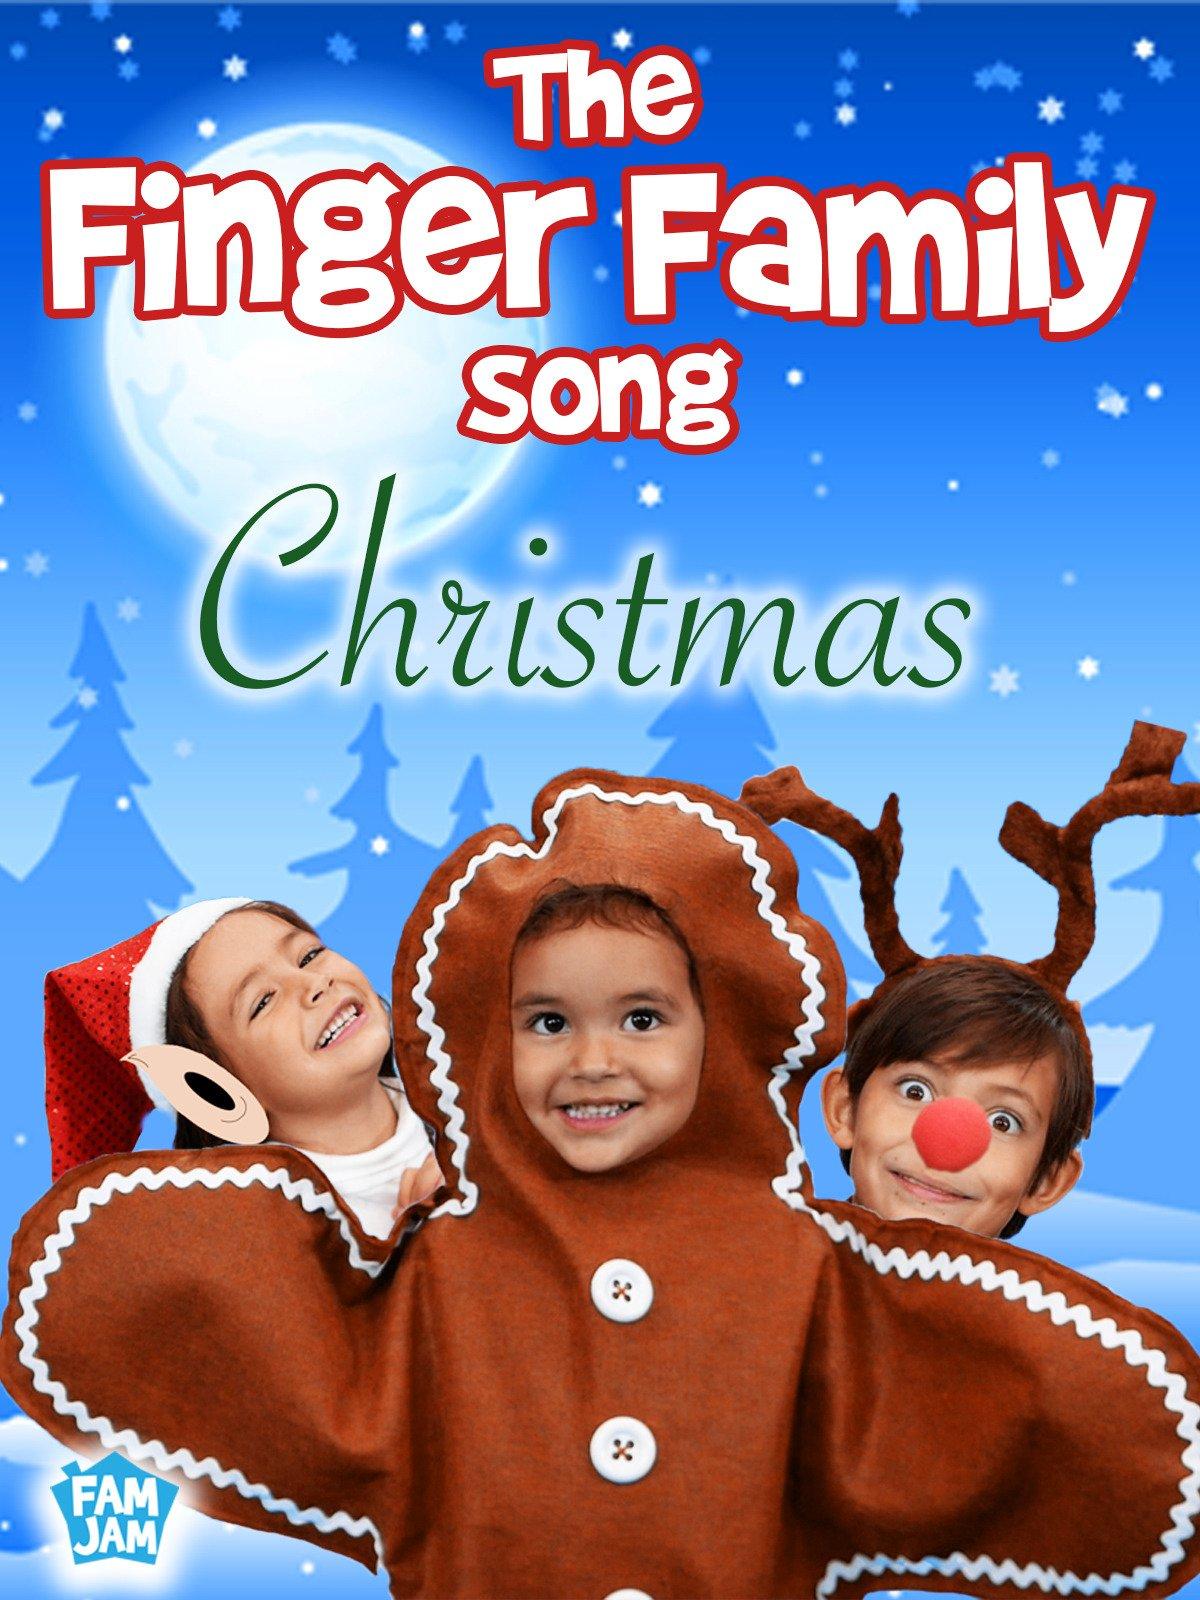 Amazon.com: The Finger Family Song Christmas: Azevedo Family, Aaron ...